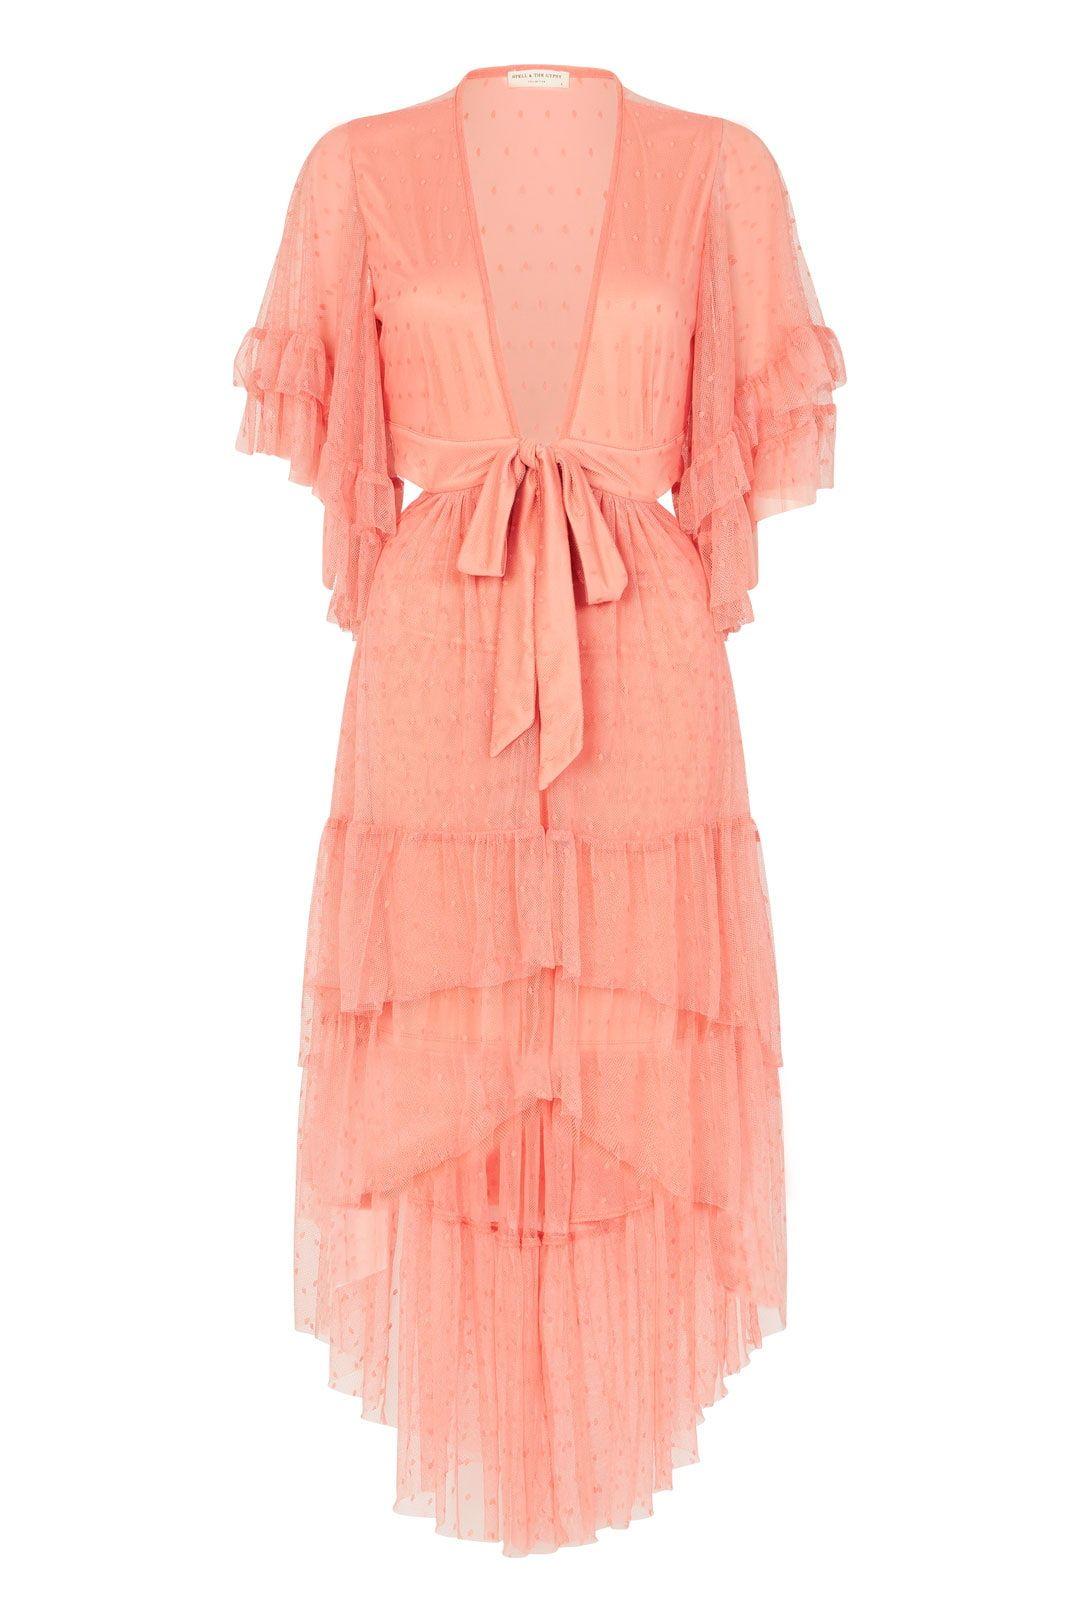 Spell Grace Cutout Gown Peach Ruffles